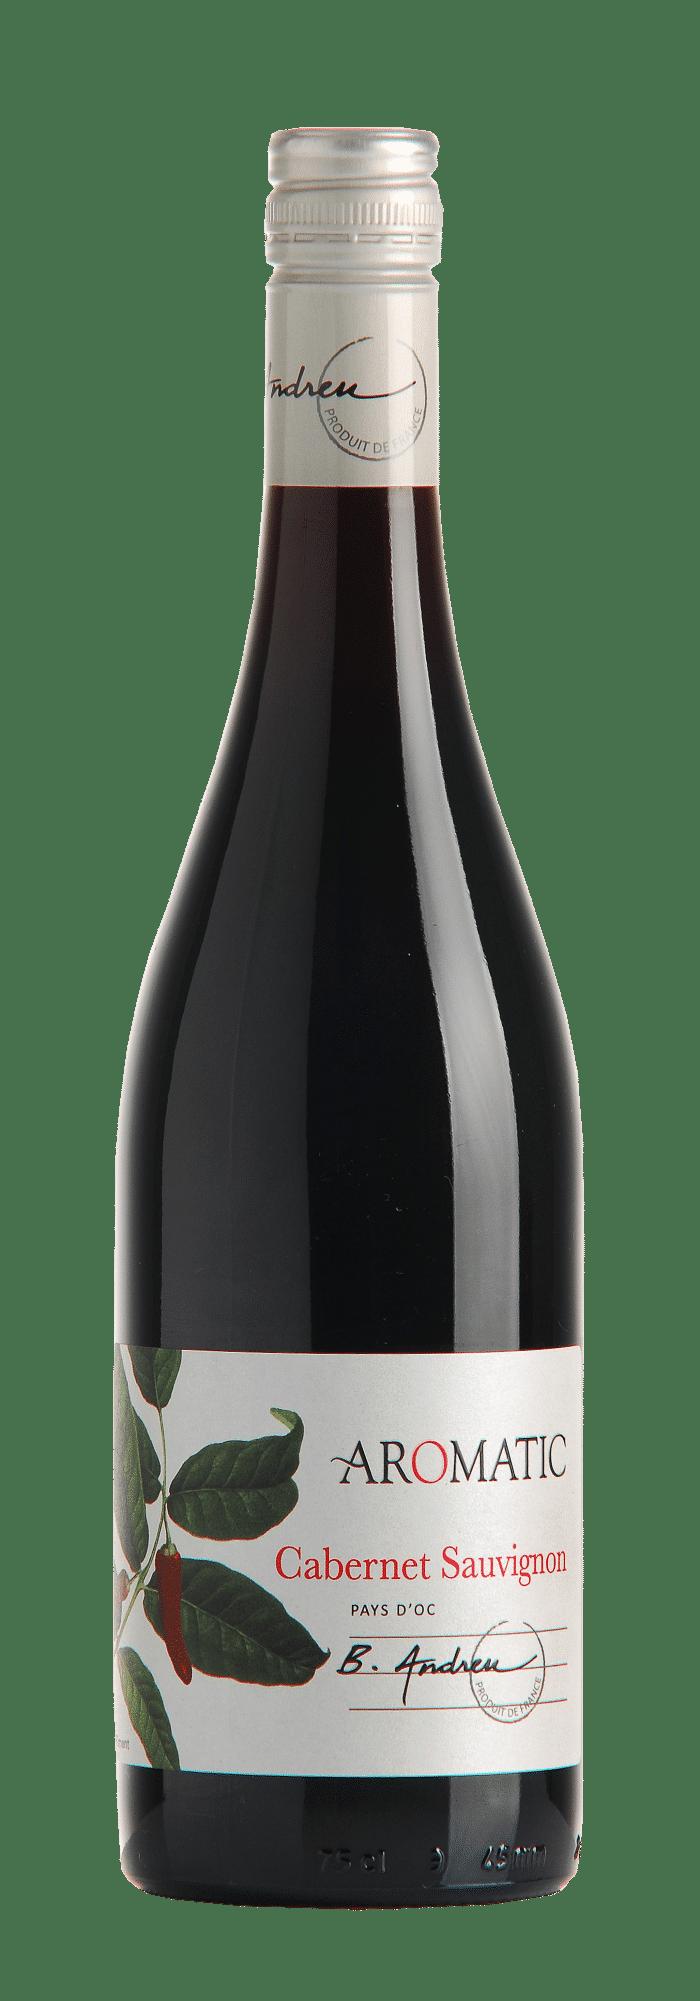 Bruno Andreu Cabernet Sauvignon 'Aromatic' | Frankrijk | gemaakt van de druif: Cabernet Sauvignon